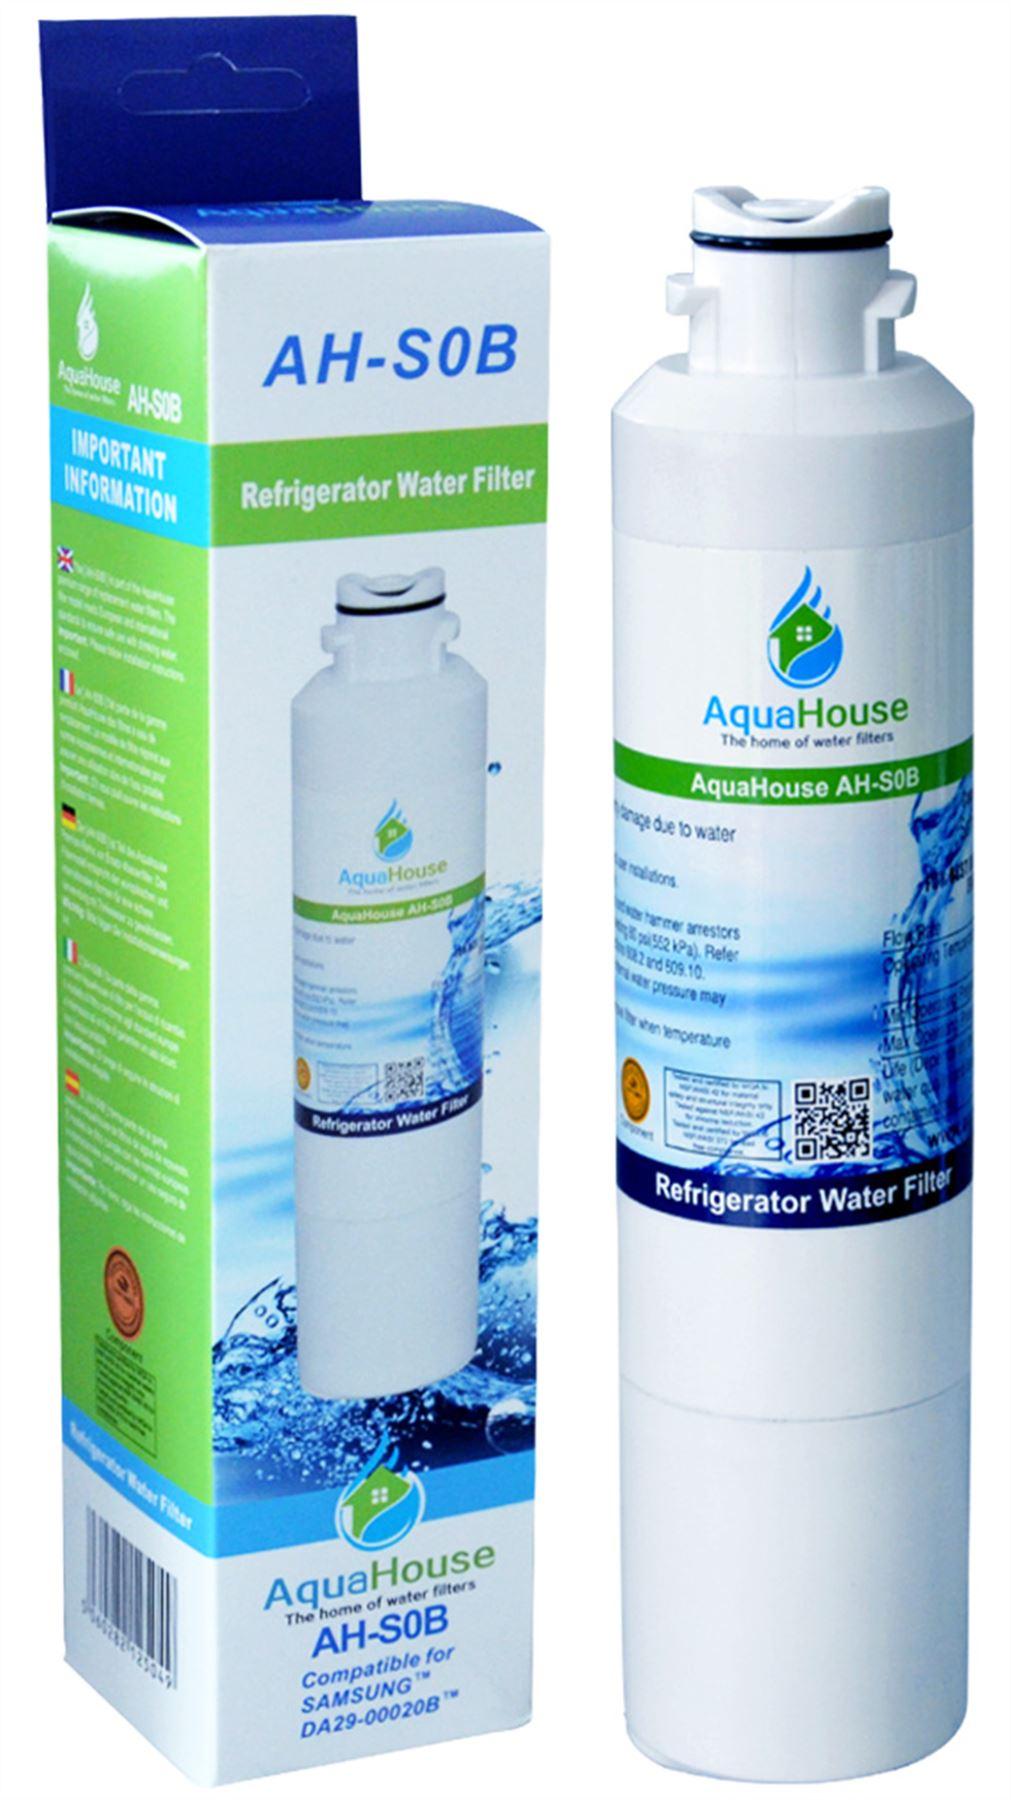 AH-S0B-Compatible-water-filter-for-Samsung-fridge-DA29-00020B-HAF-CIN-EXP-Aqua